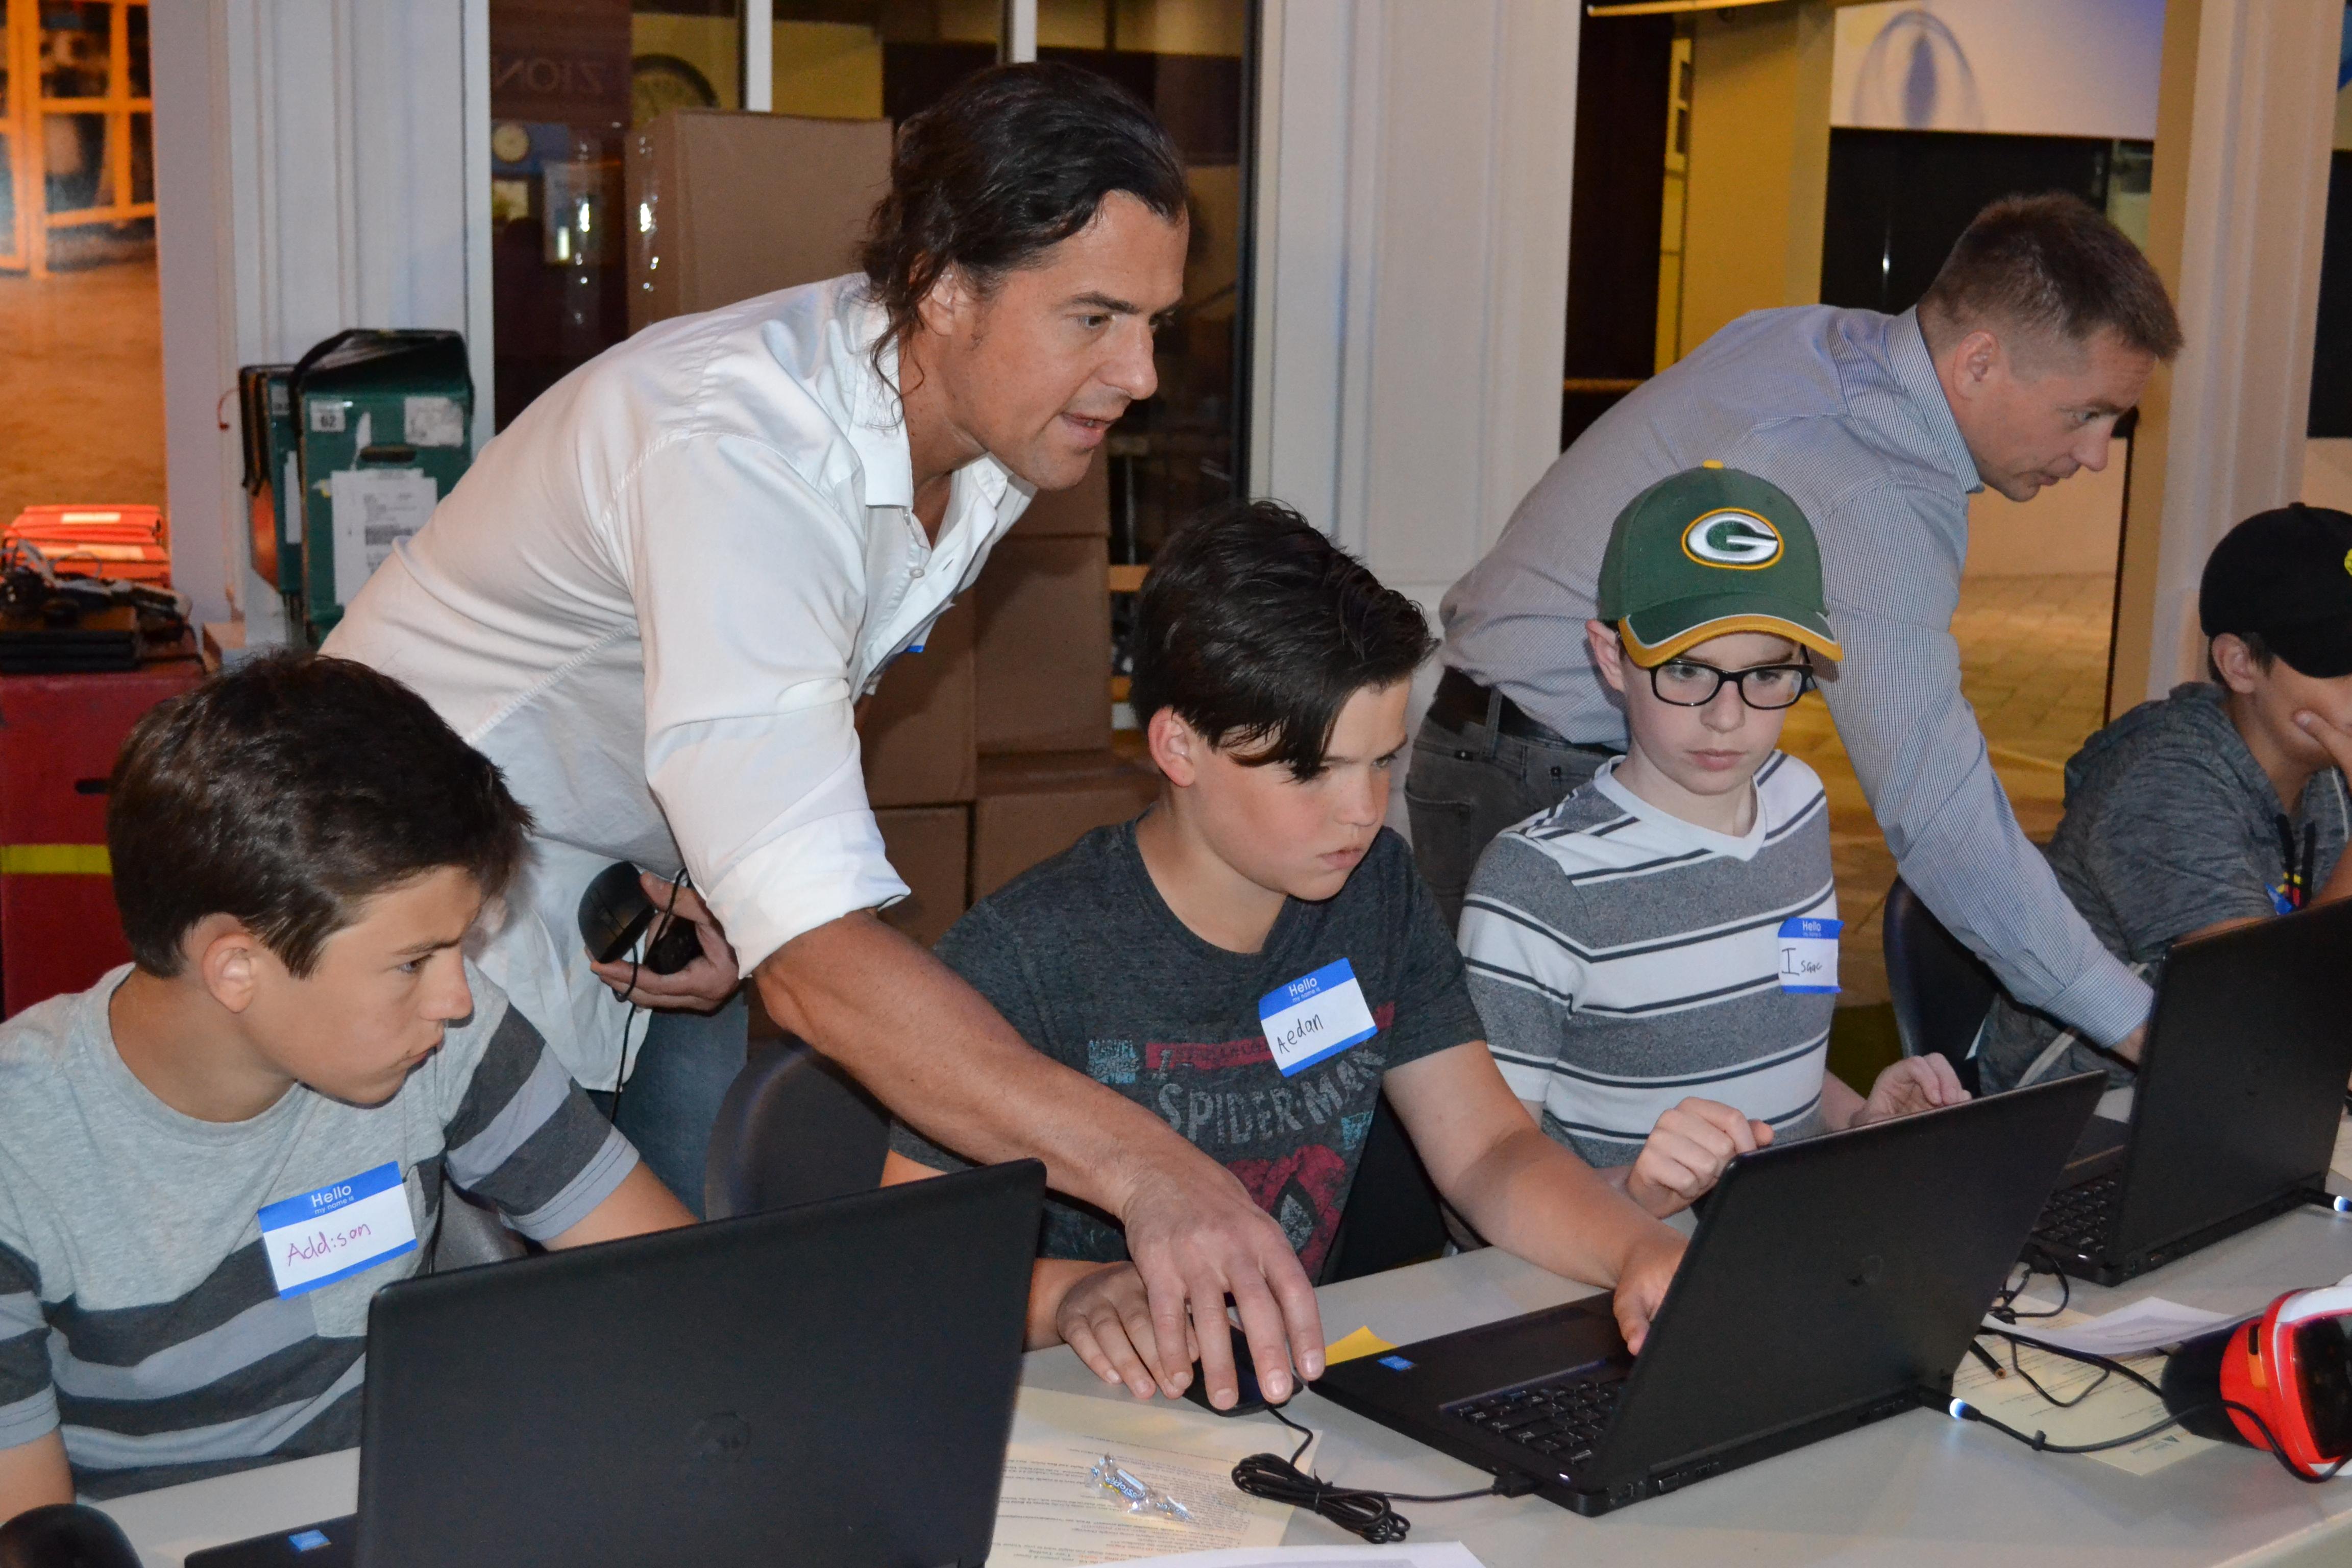 Ryan Buchanan showing students VR on computer